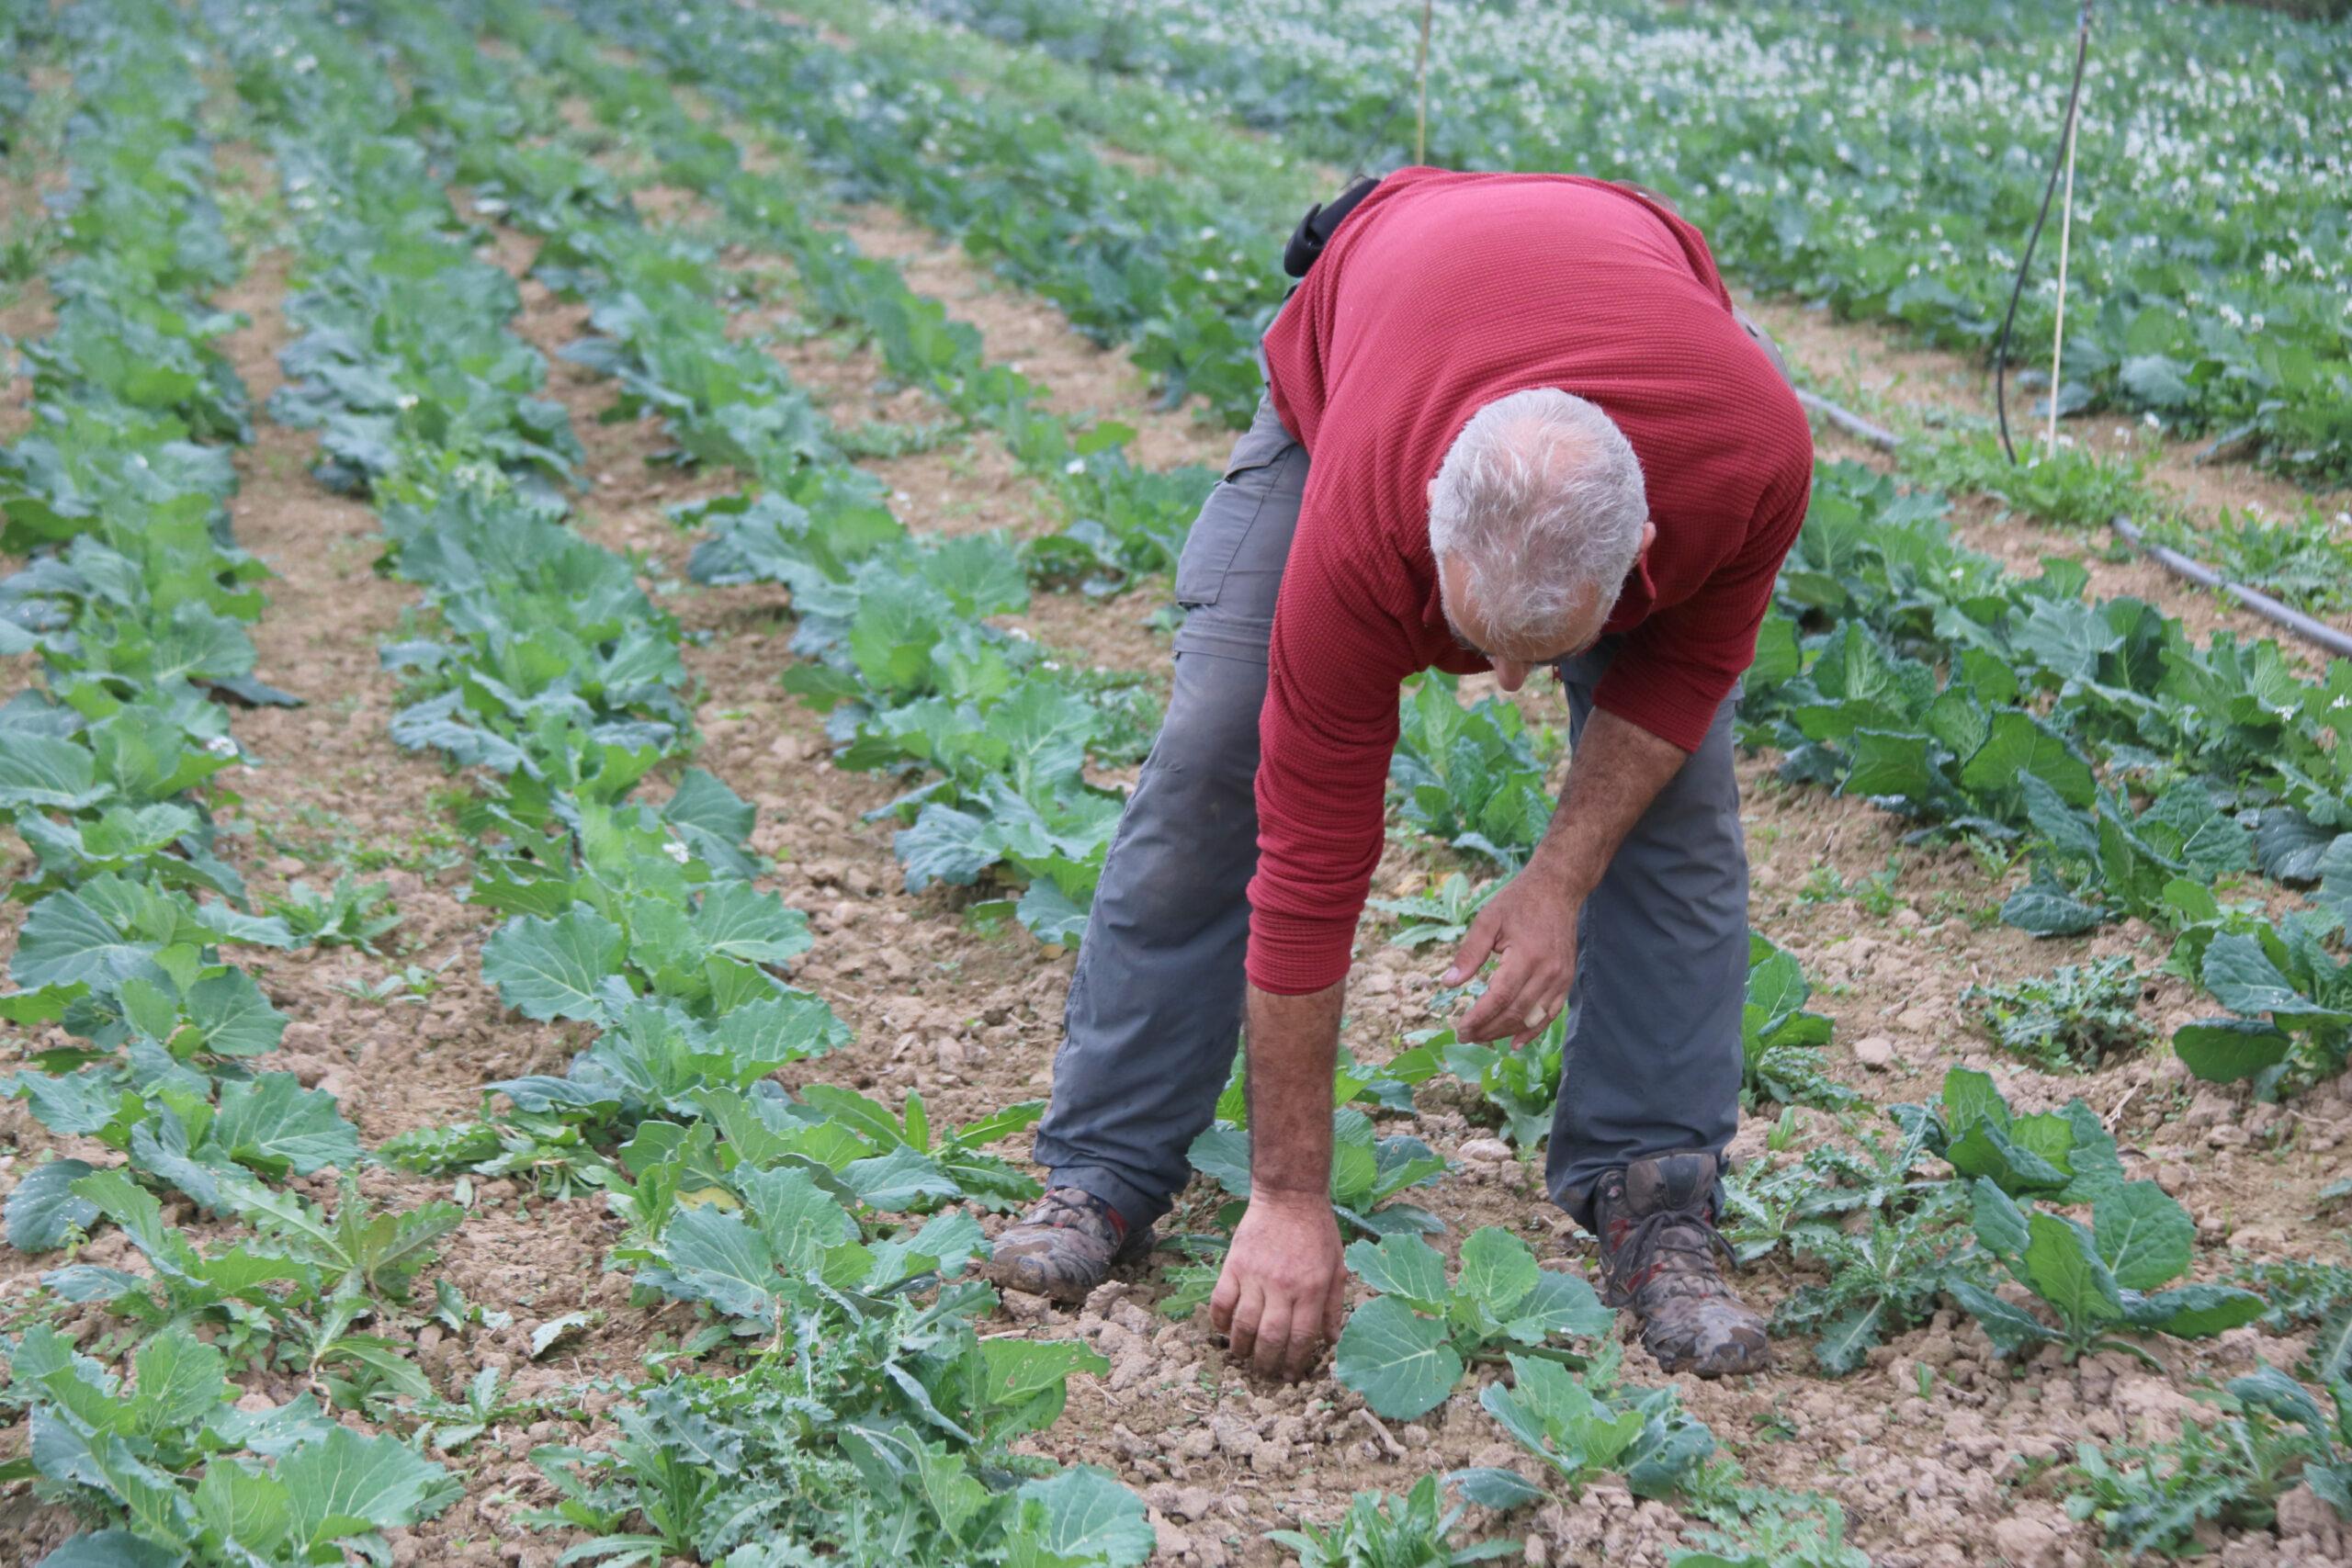 En Joan Coll, un dels pagesos que participa en la iniciativa de Xarxa Pagesa al seu camp a Albons | ACN